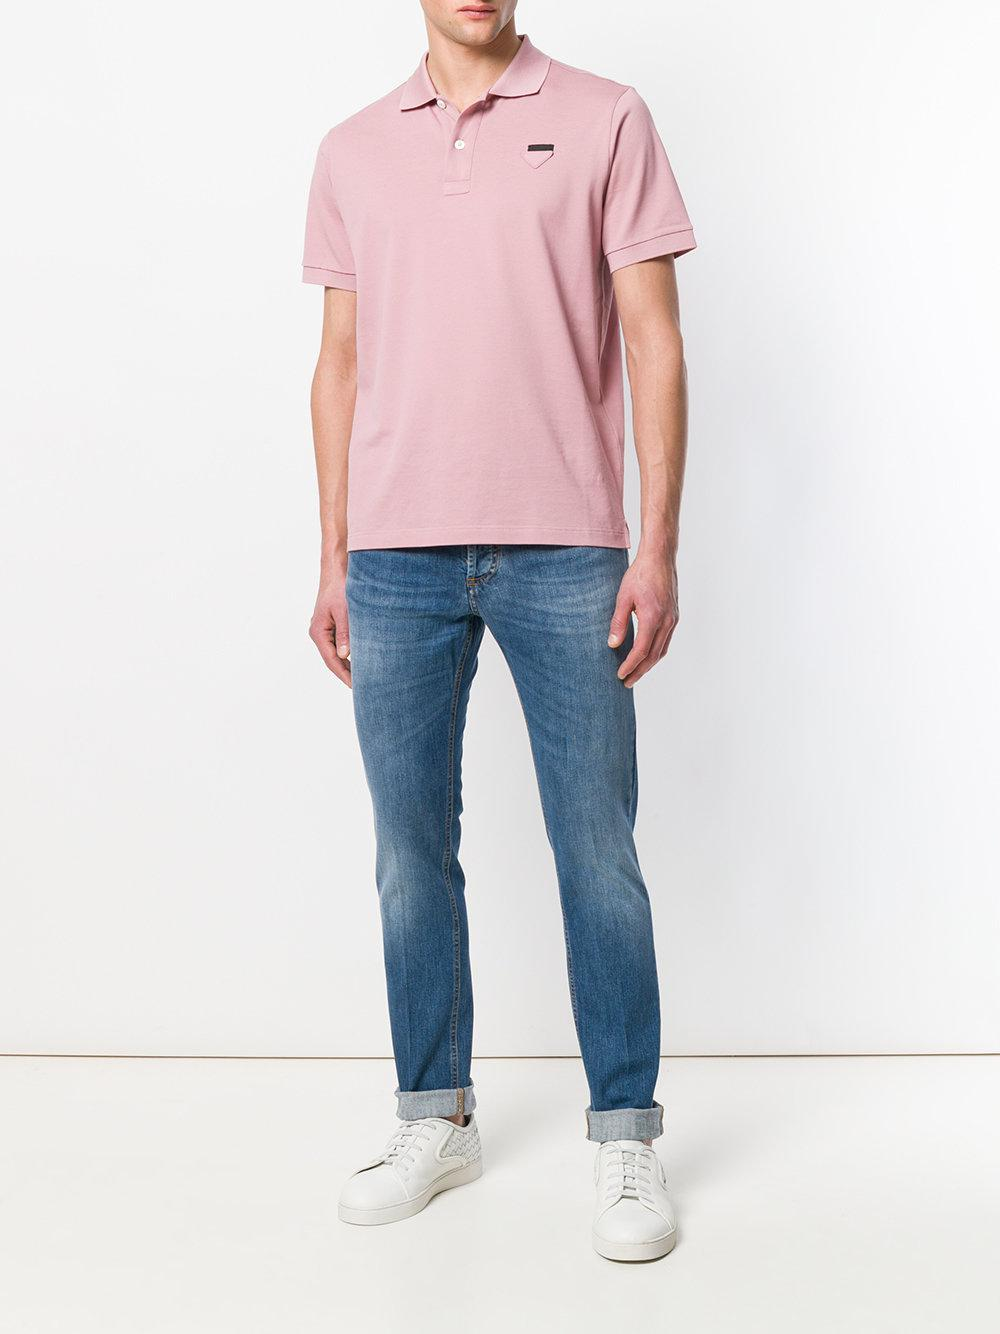 Entre Amis Denim Turn-up Straight Leg Jeans in Blue for Men